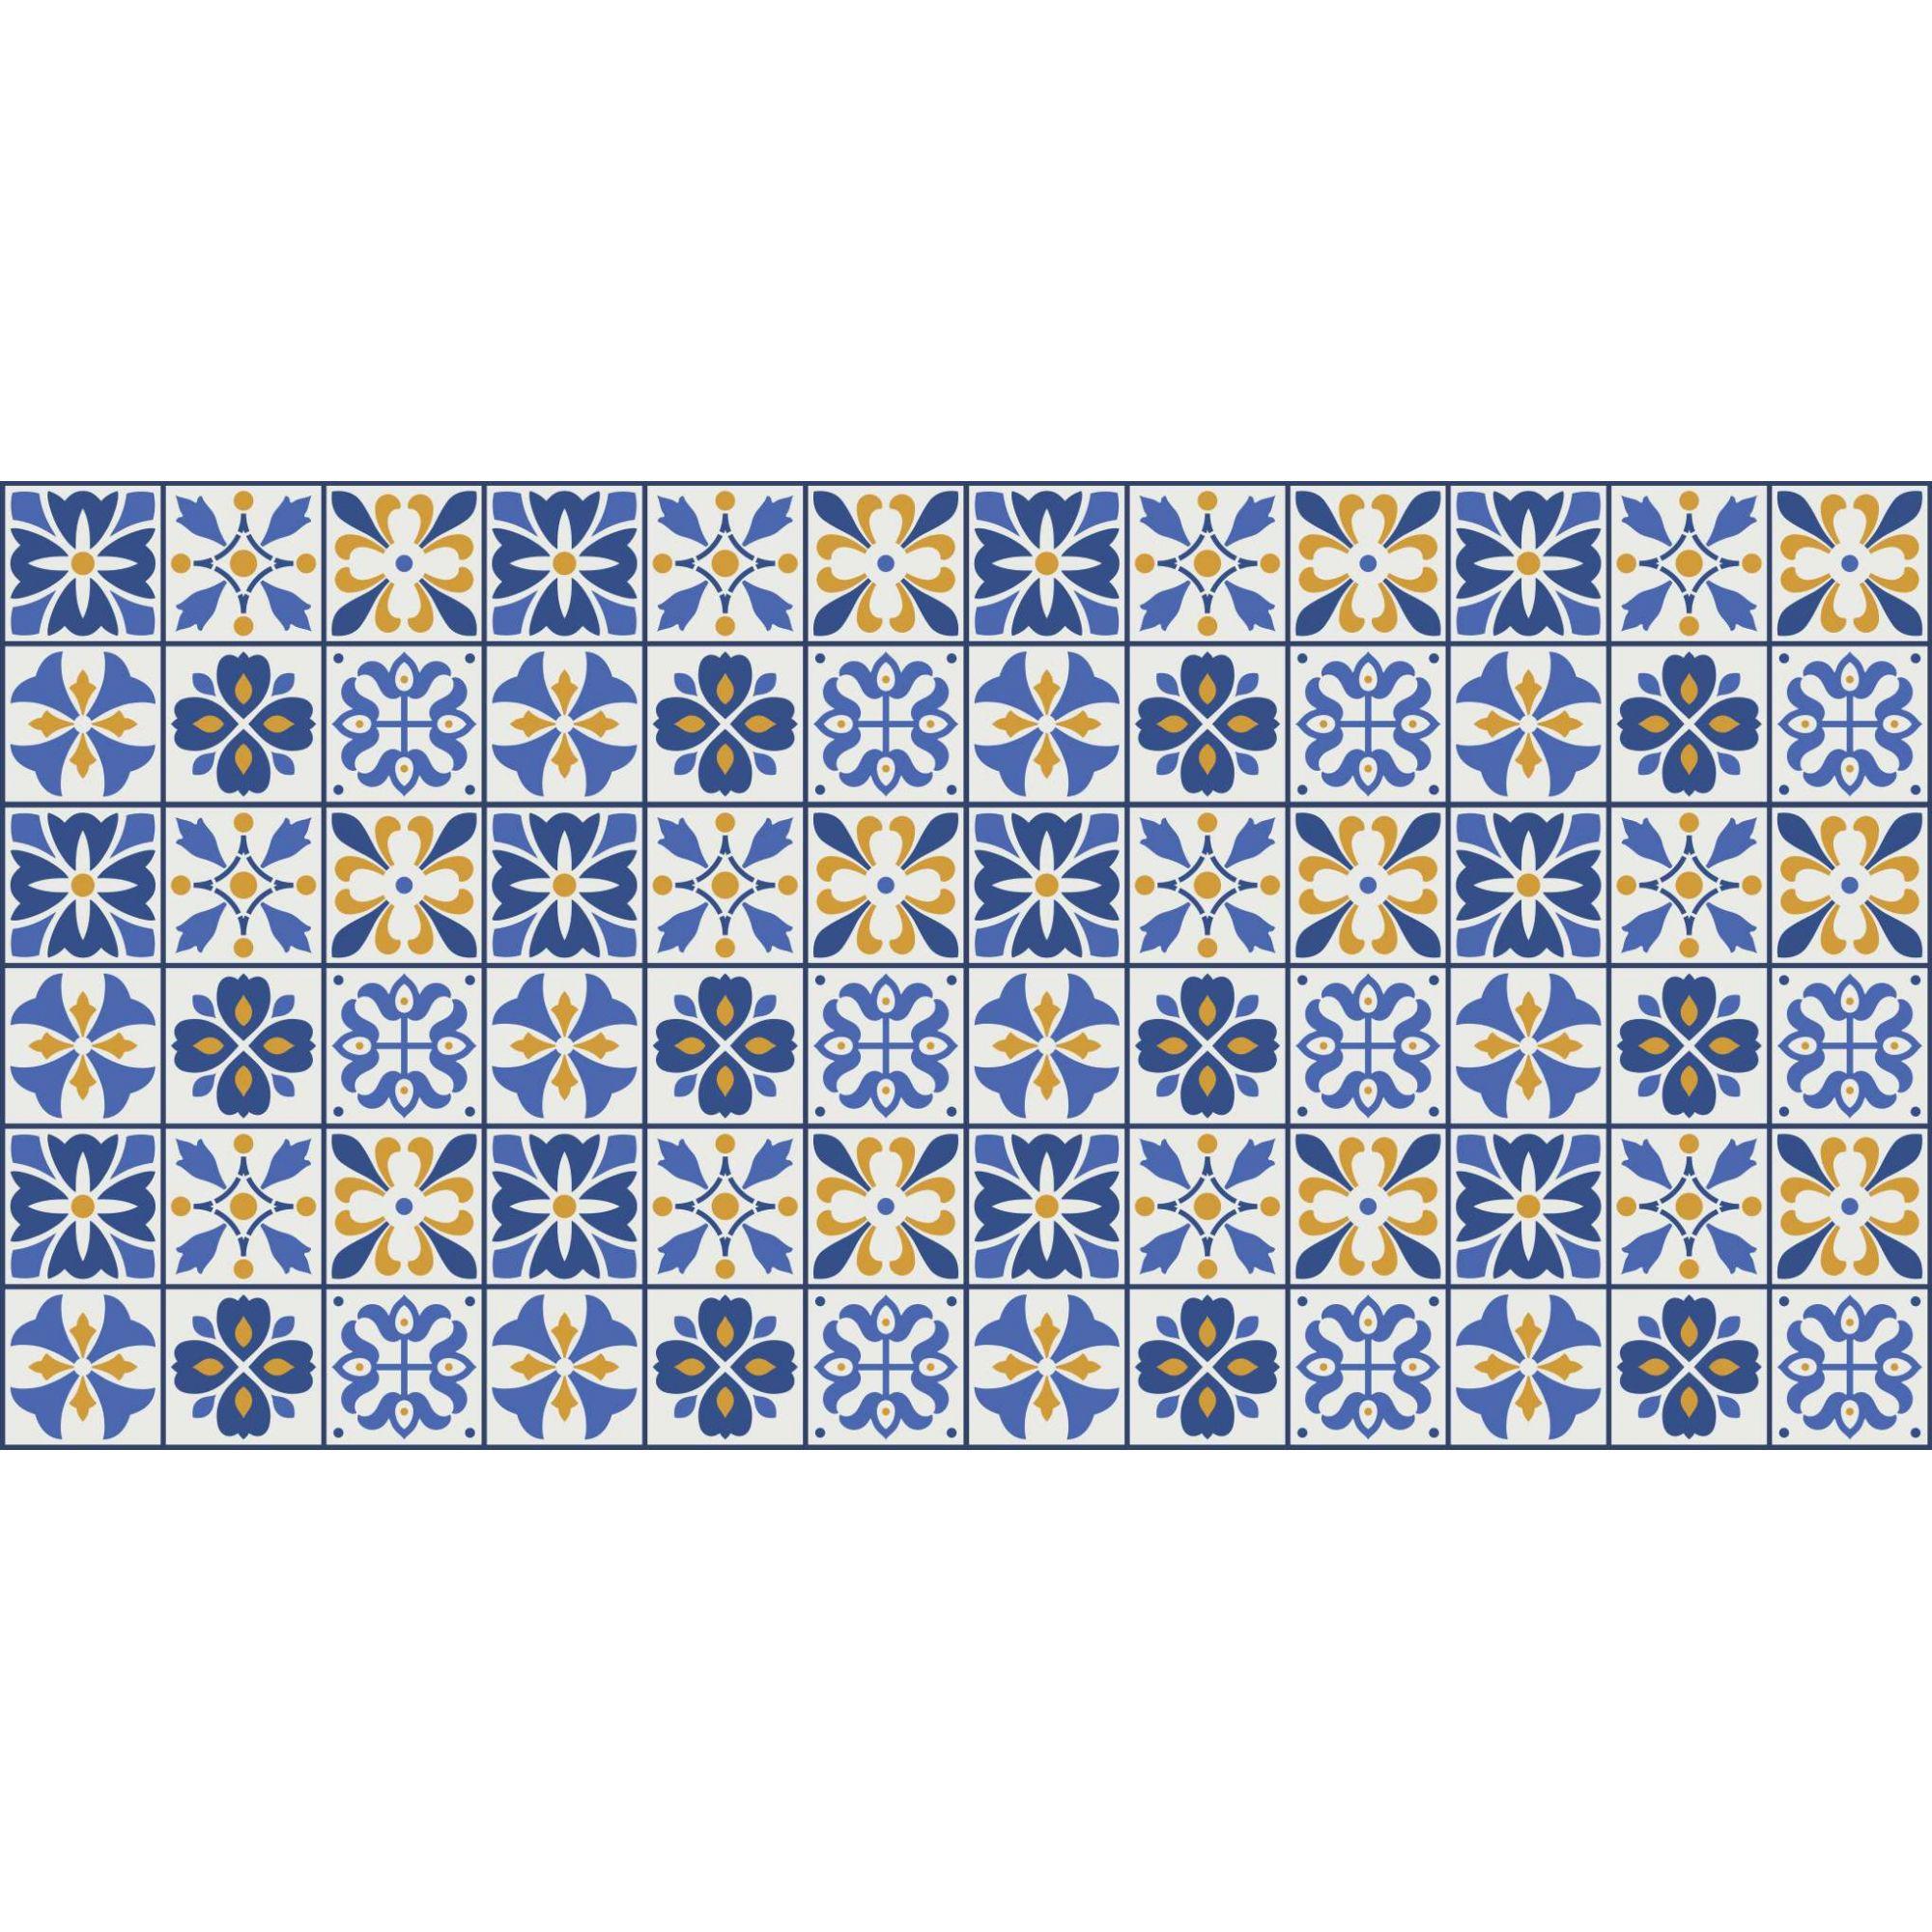 Papel de Parede Autocolante Azulejo Fundo Branco